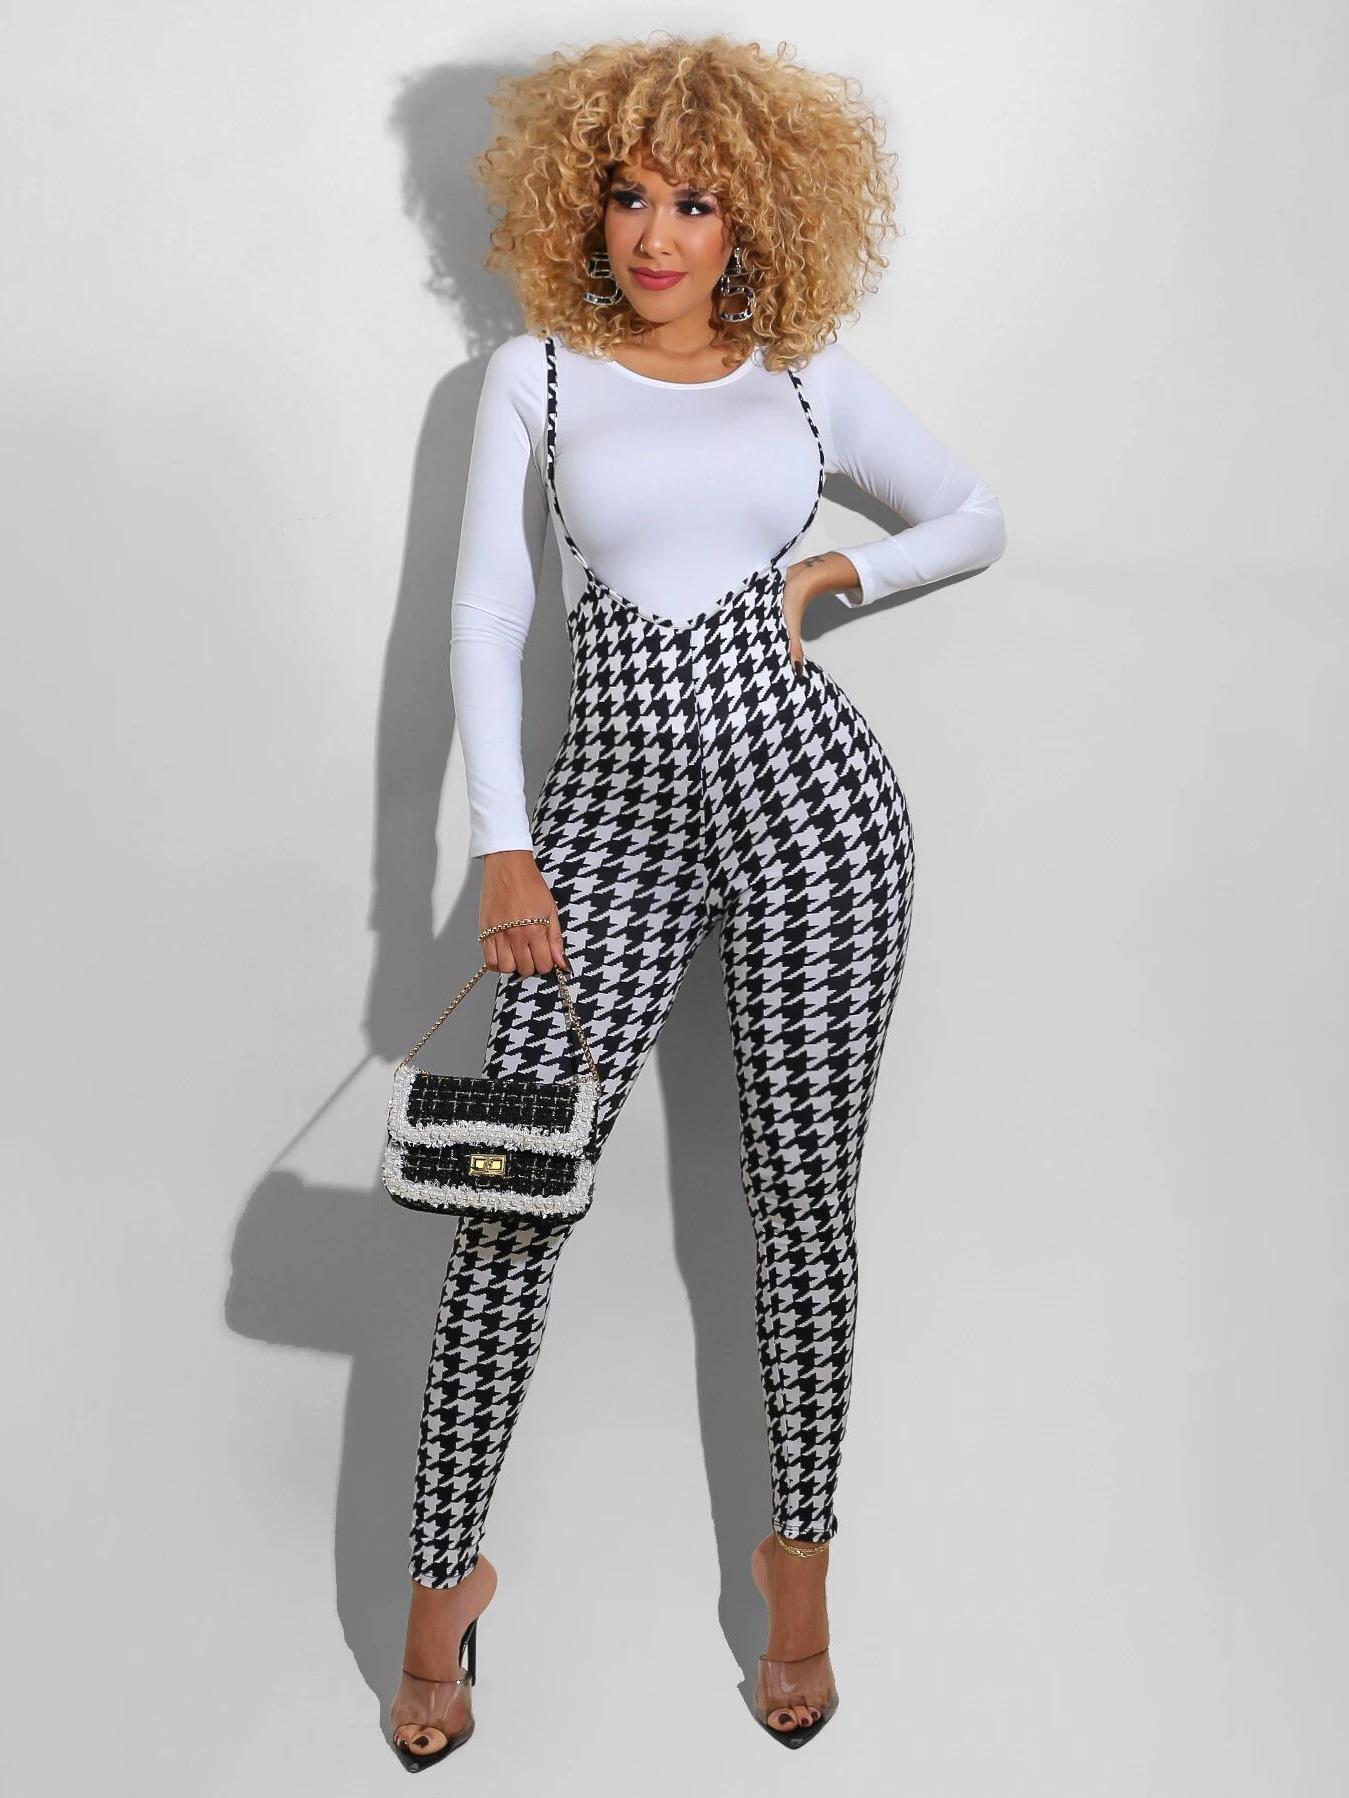 Fashion Long Sleeve Top With Plaid Pants